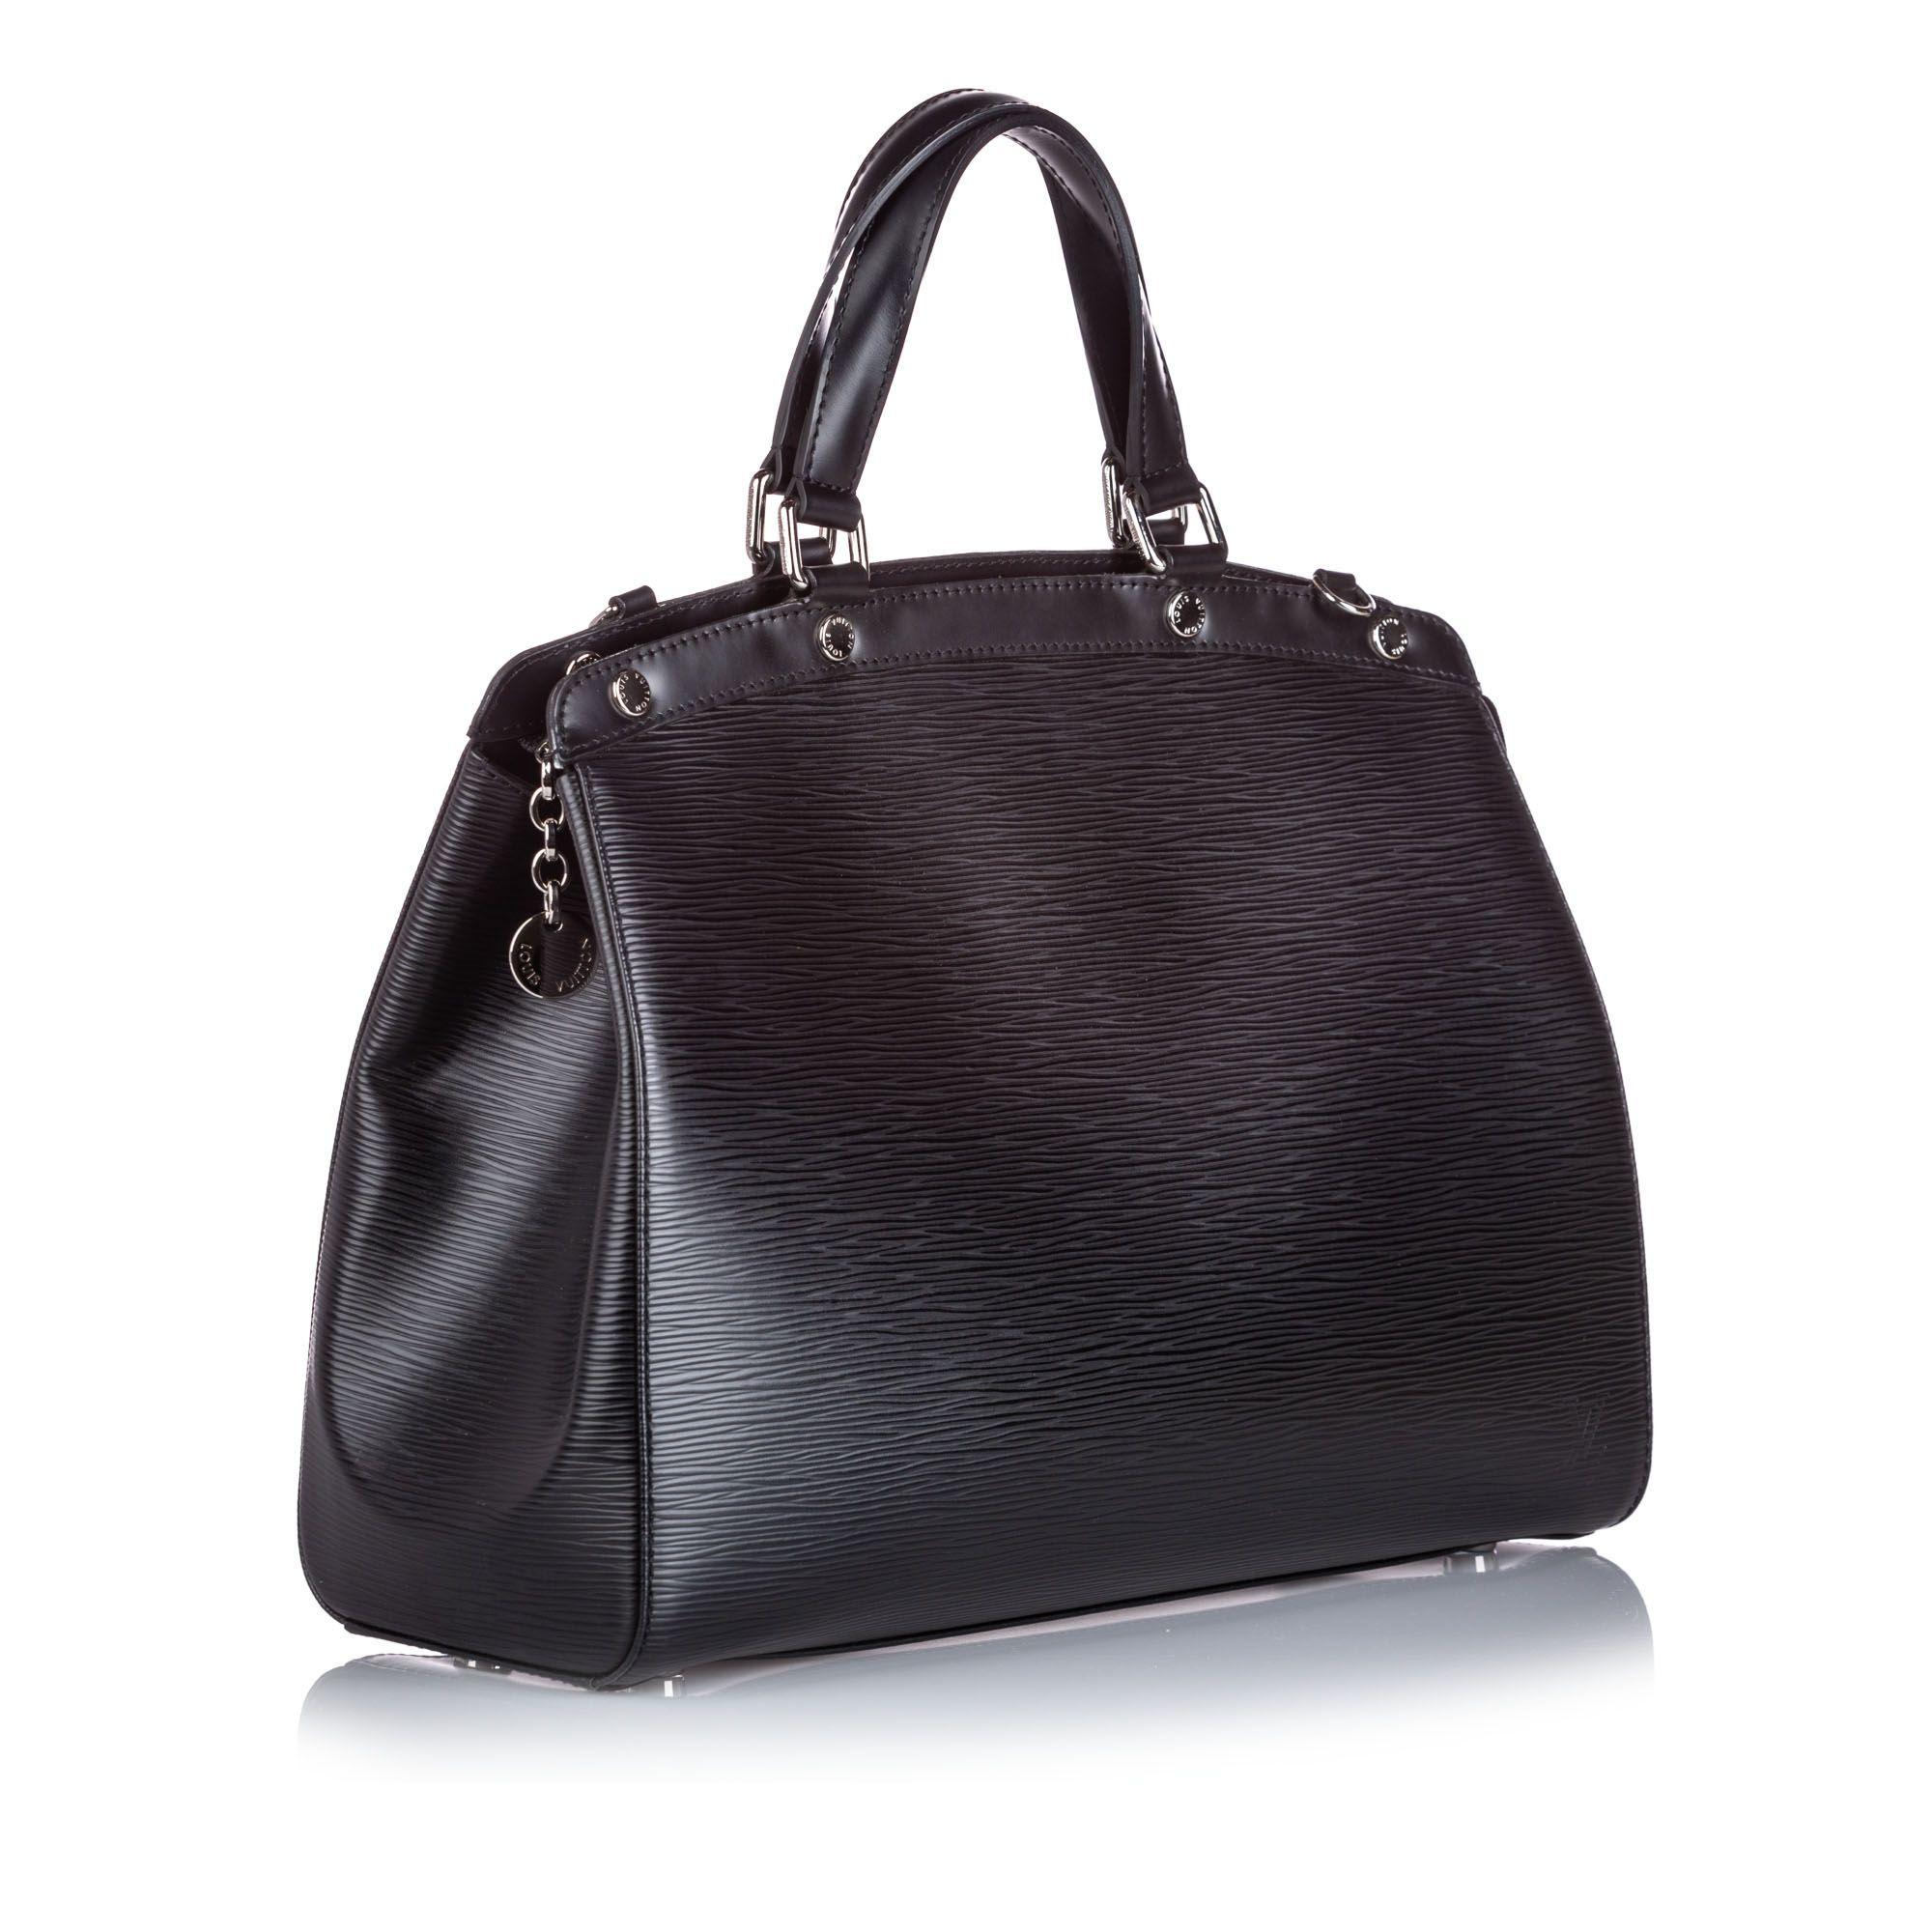 Vintage Louis Vuitton Epi Brea GM Brown